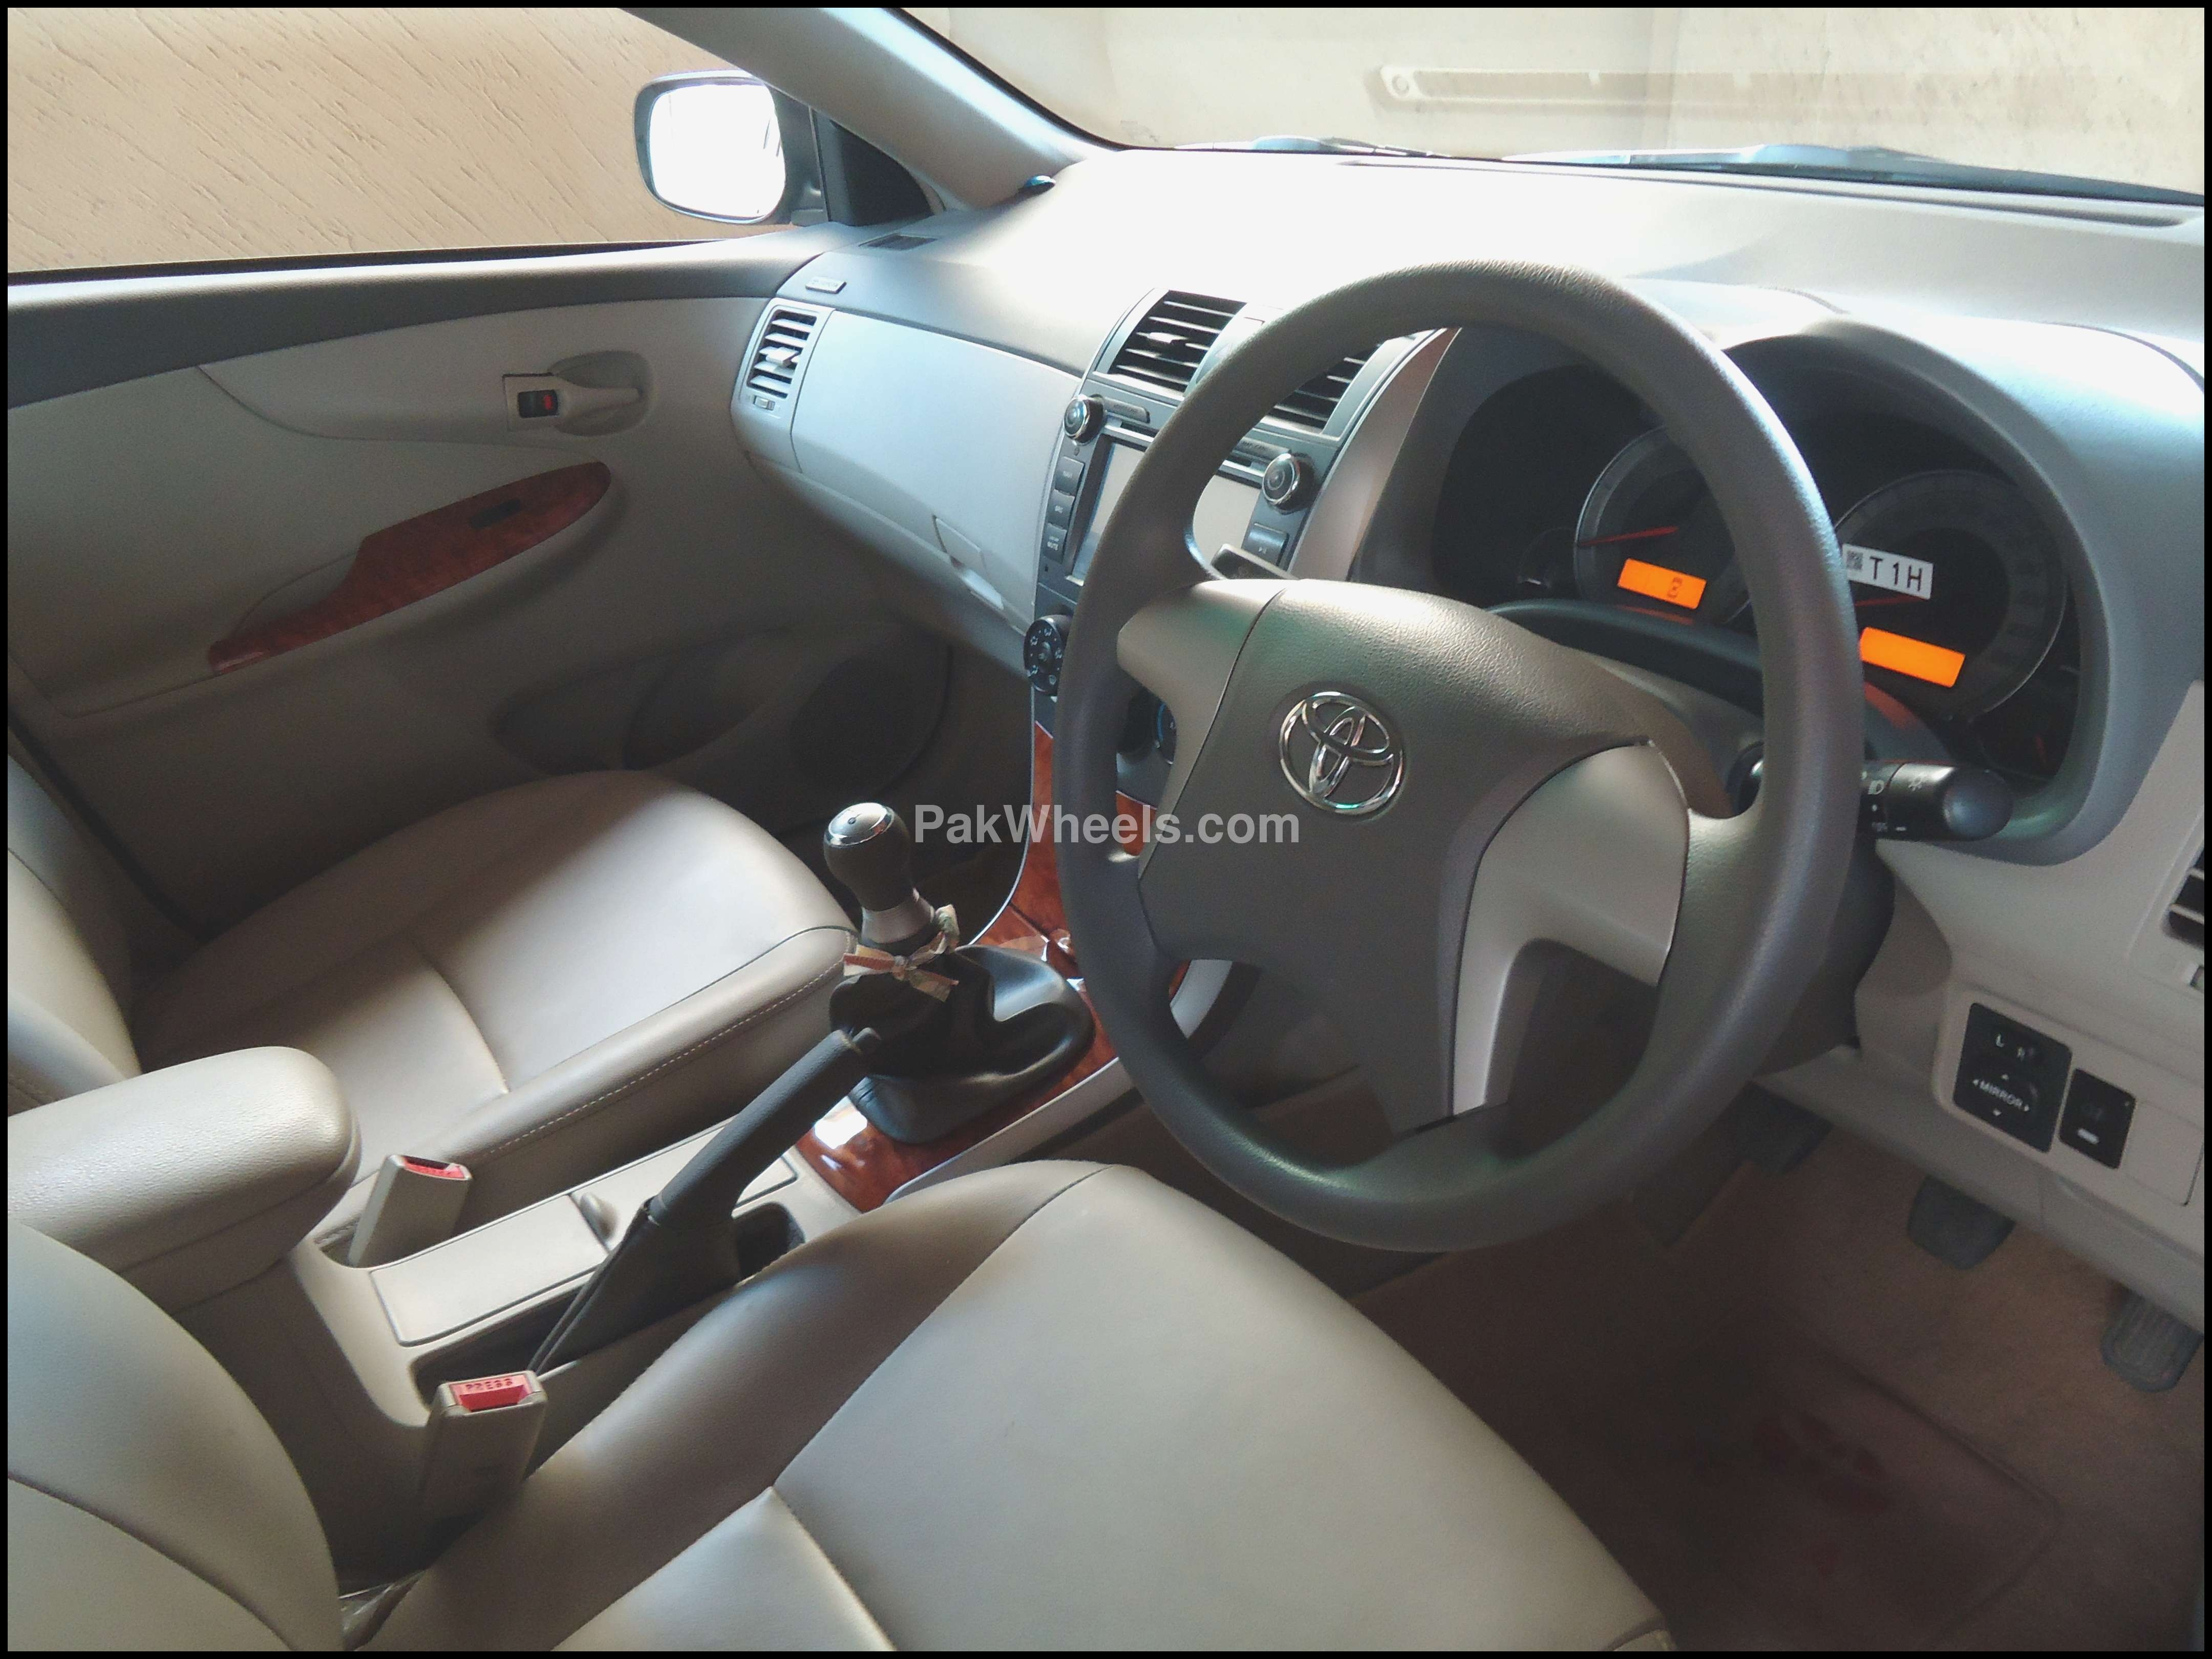 Top 2018 Corolla Price toyota Corolla 2 0d Saloon Sr 2010 for Sale In islamabad toyota